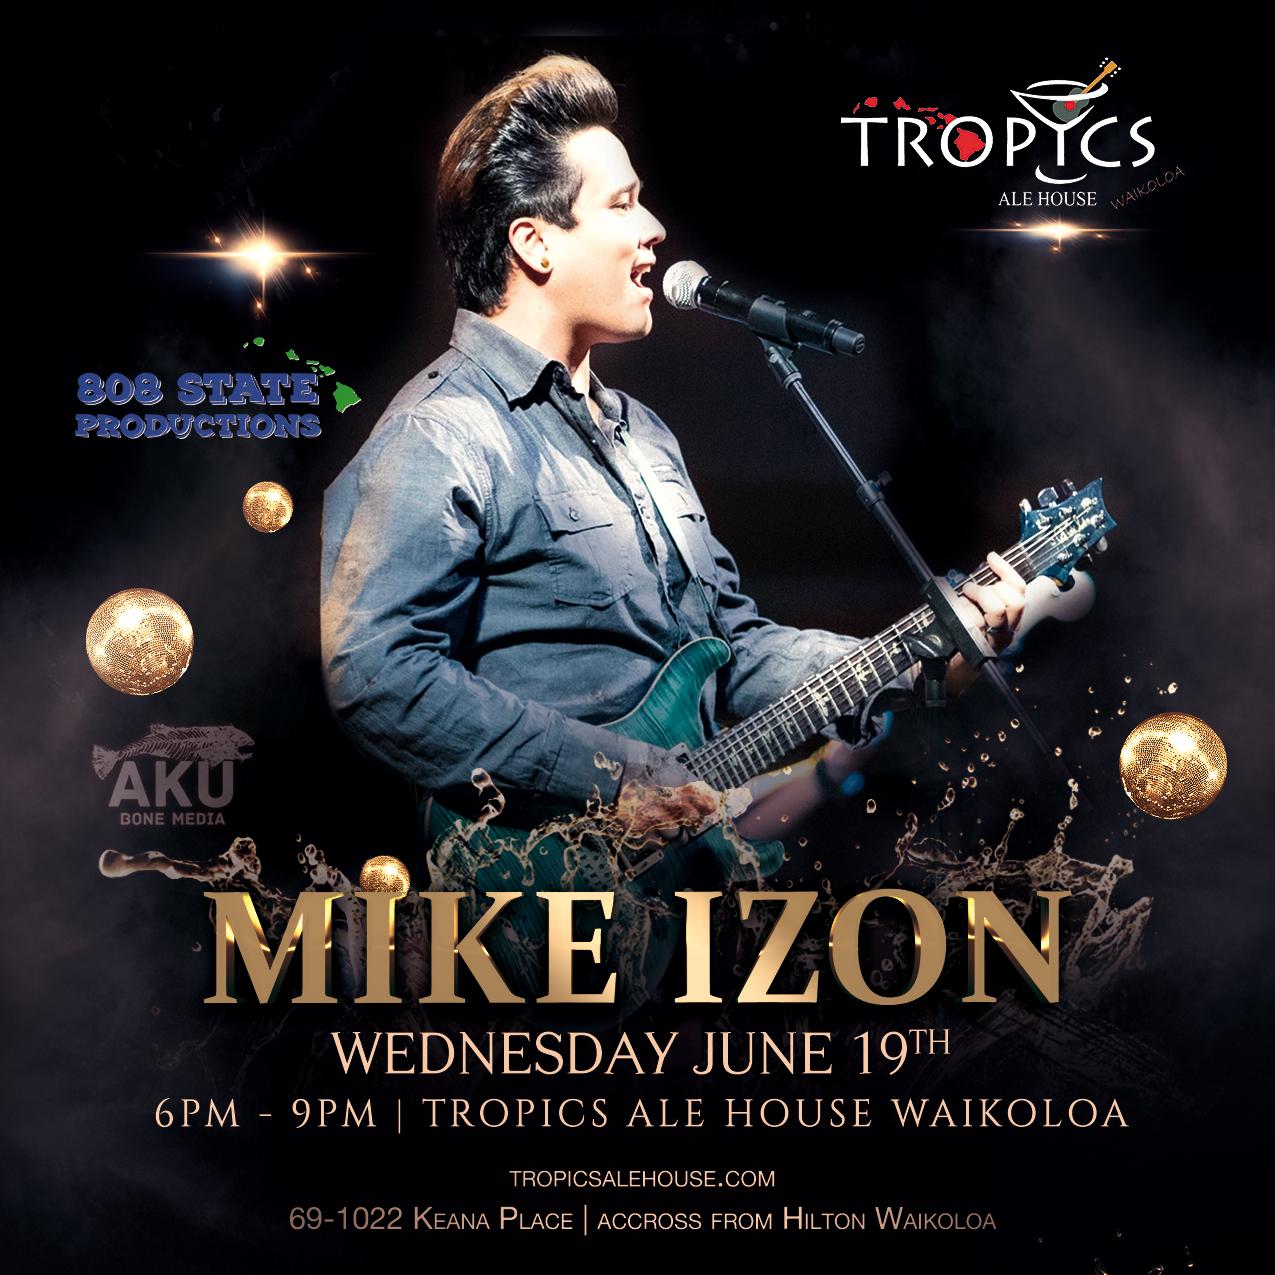 06192019-Mike-Izon-Tropics-Waikaloa-1080x1080.jpg